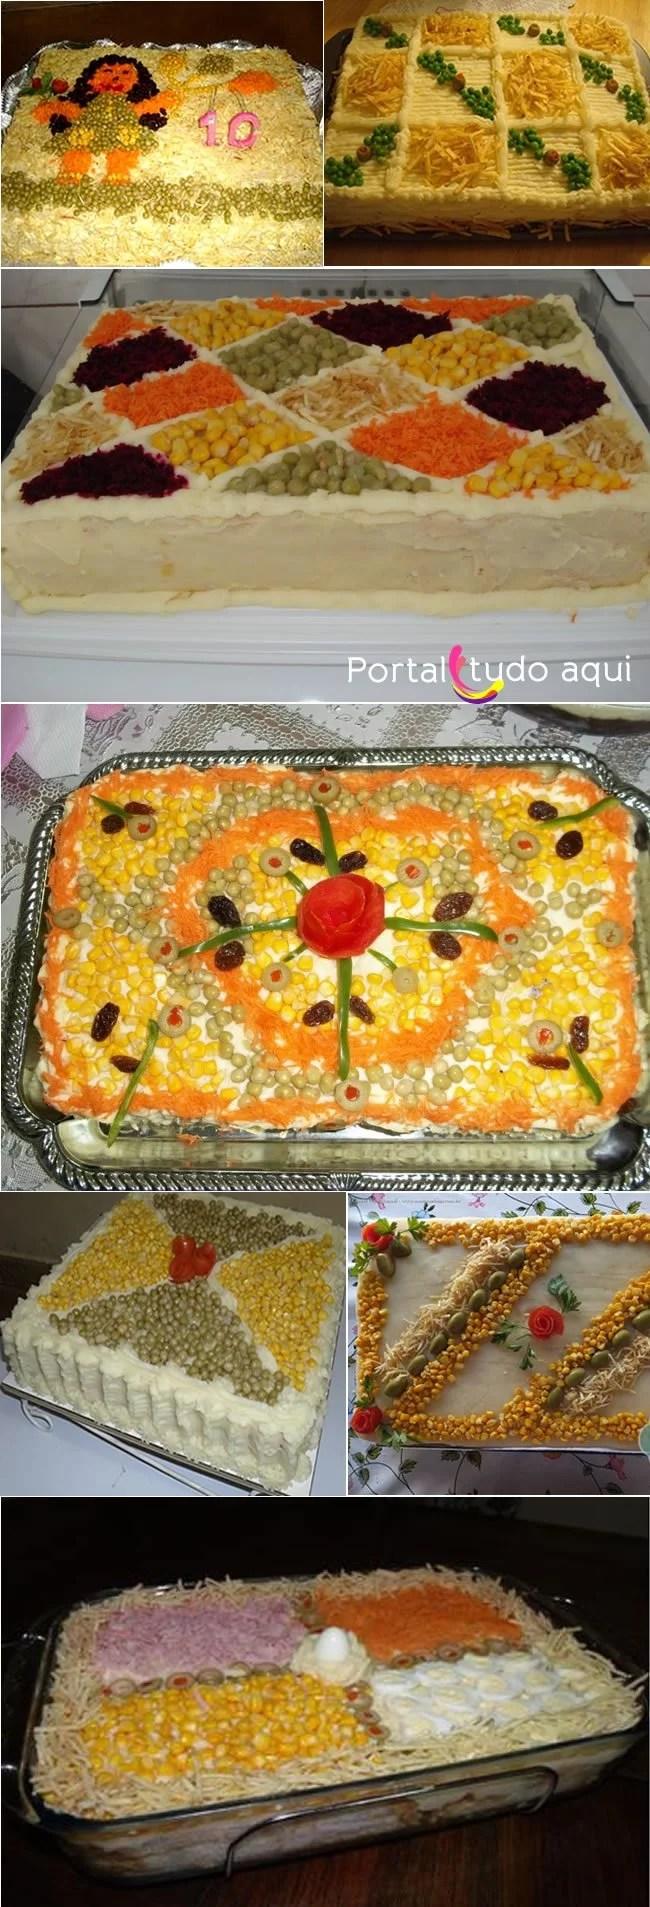 tortas-salgadas-pao-de-forma-decoracao